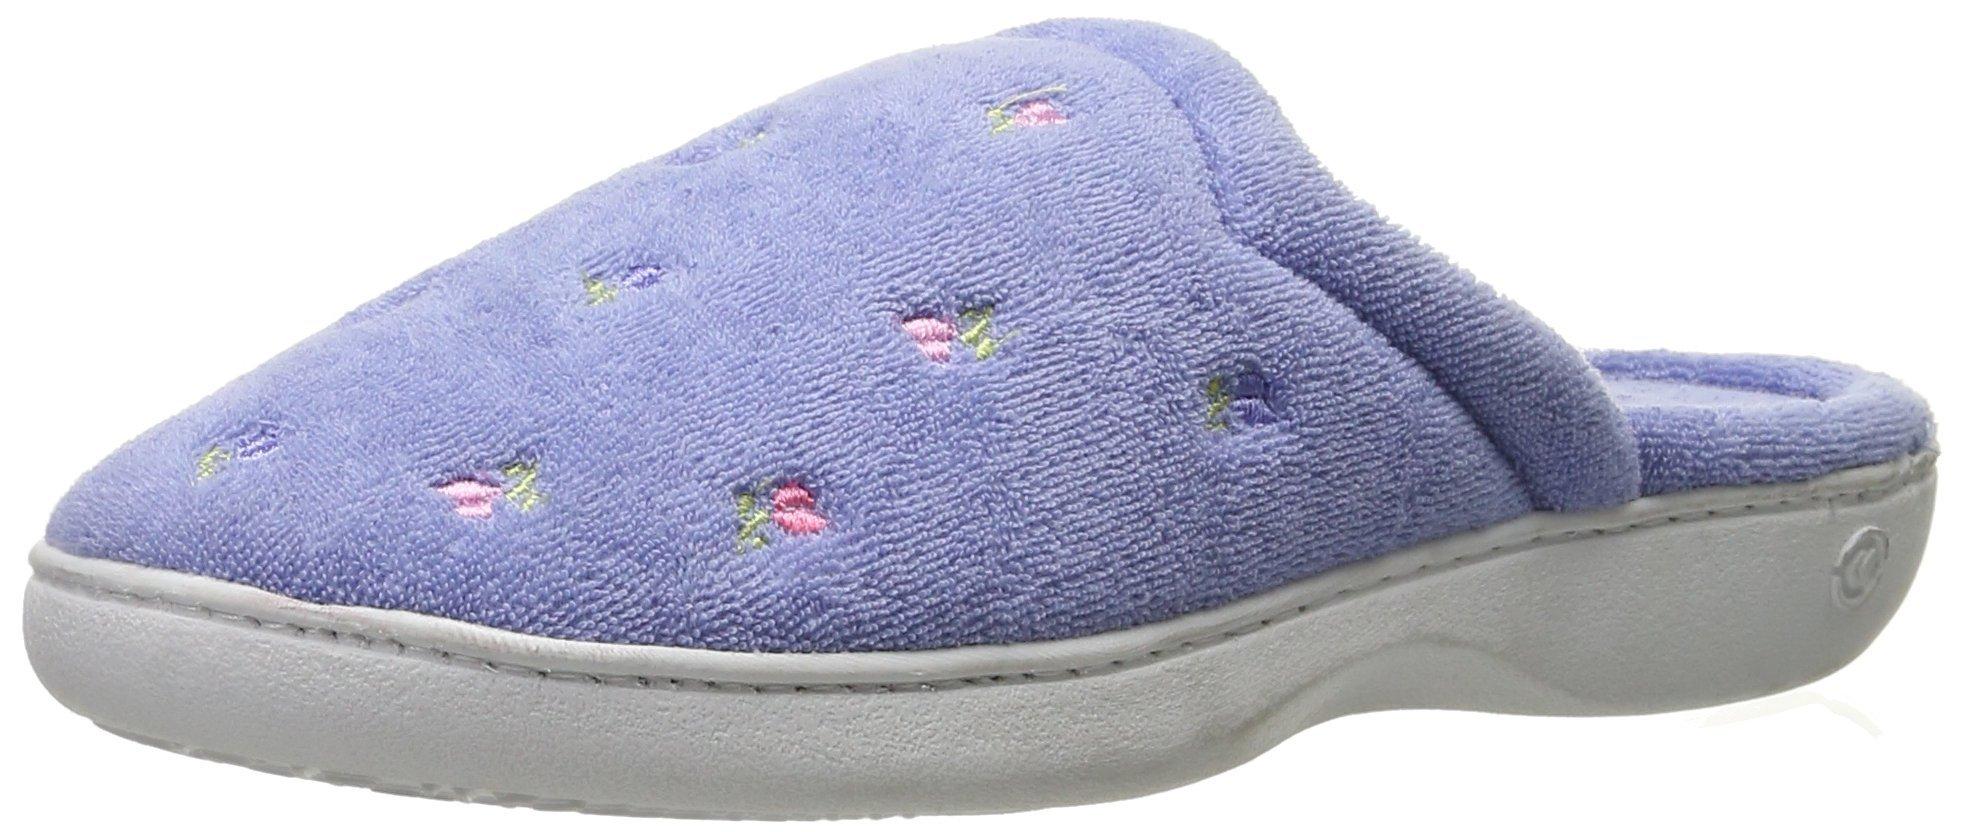 ISOTONER Women's Terry Slip On Clog Slipper with Memory Foam for Indoor/Outdoor Comfort,Periwinkle,Medium/7.5-8 M US